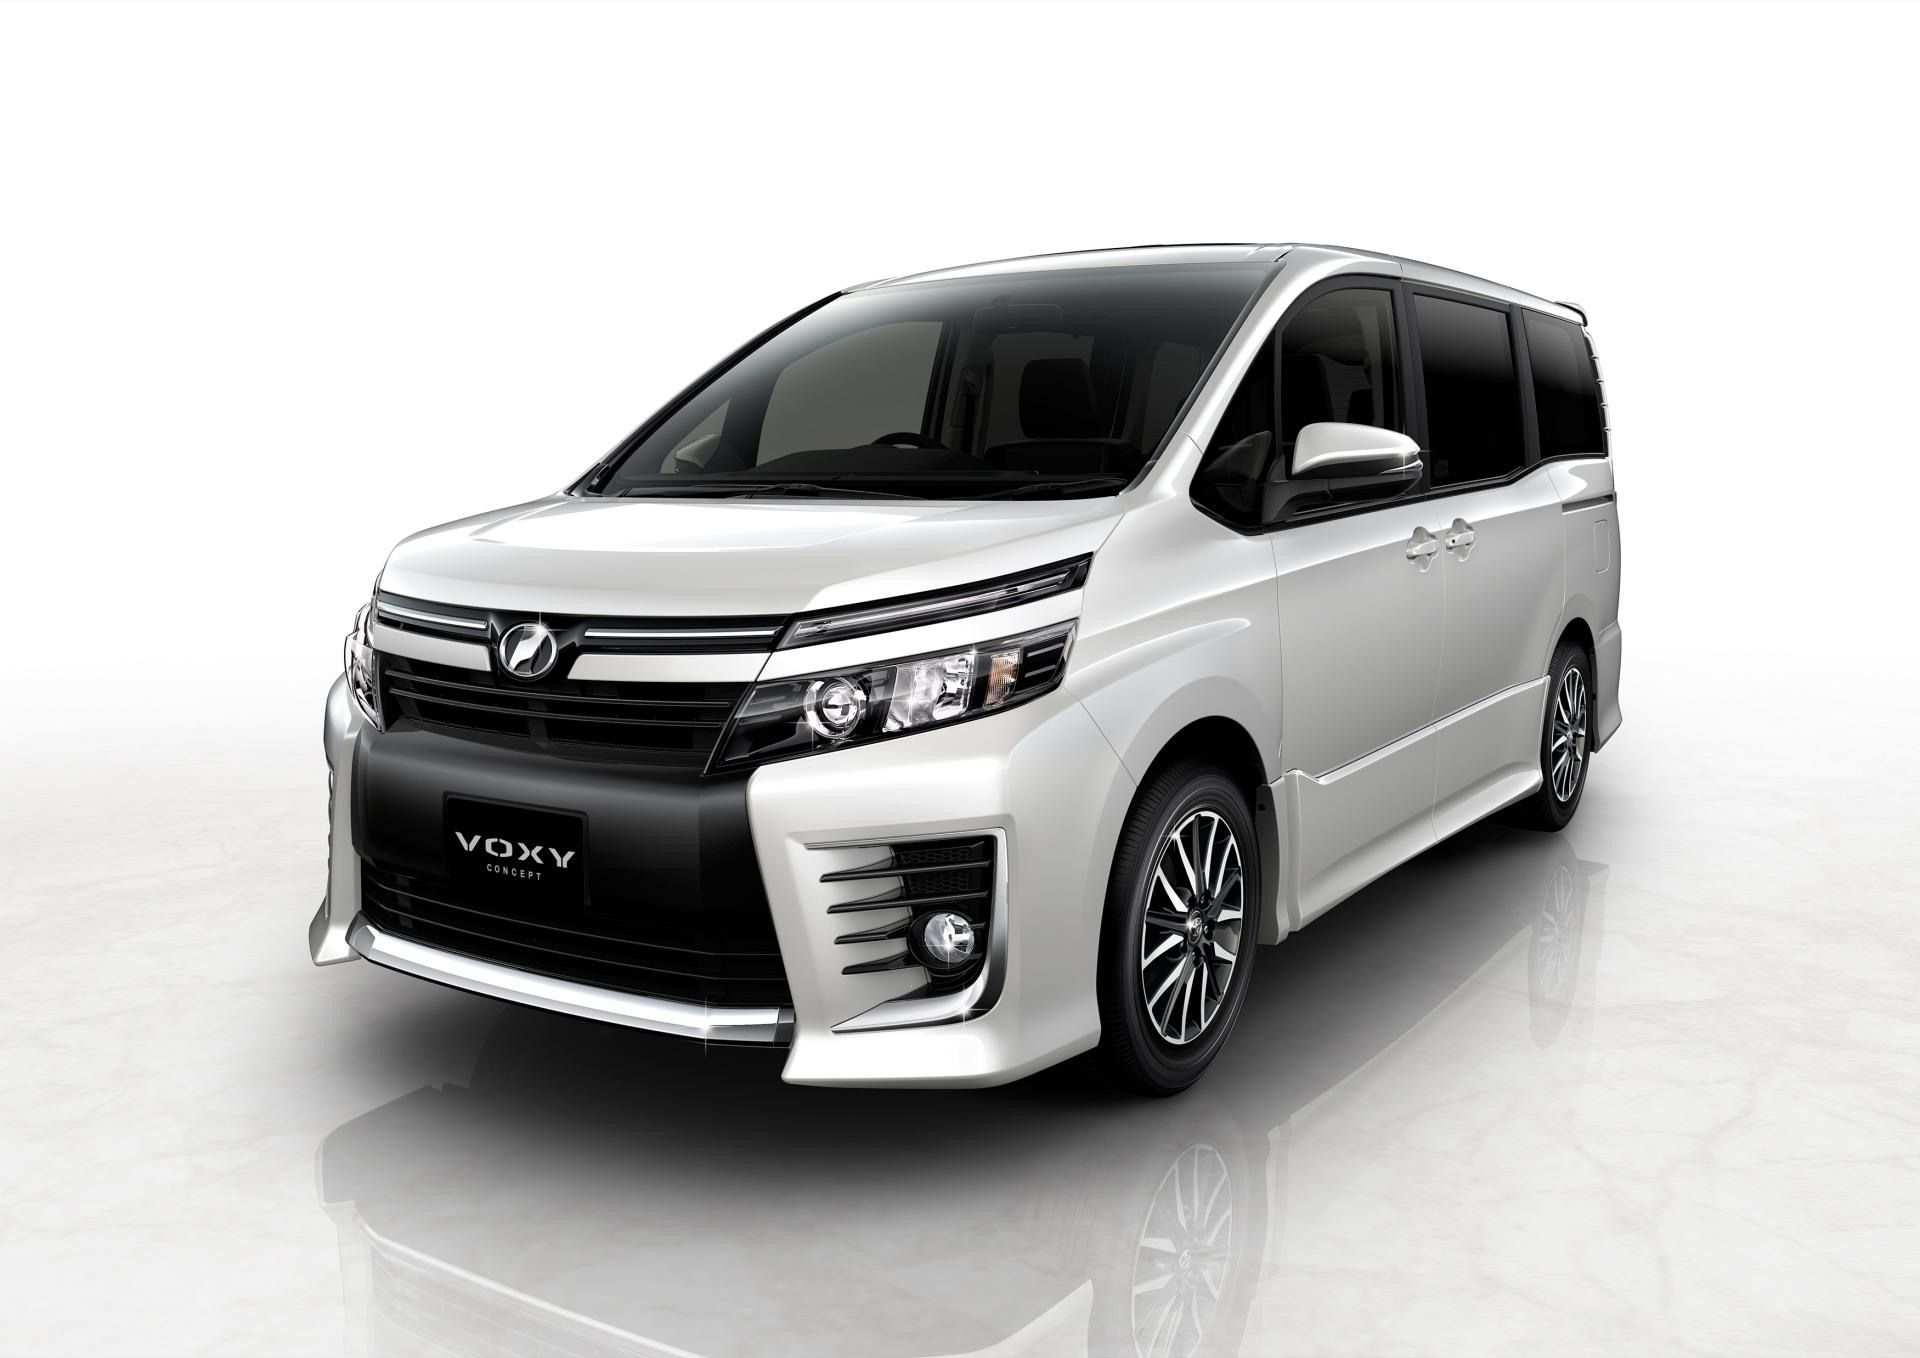 94 New Toyota Van 2020 Pricing by Toyota Van 2020